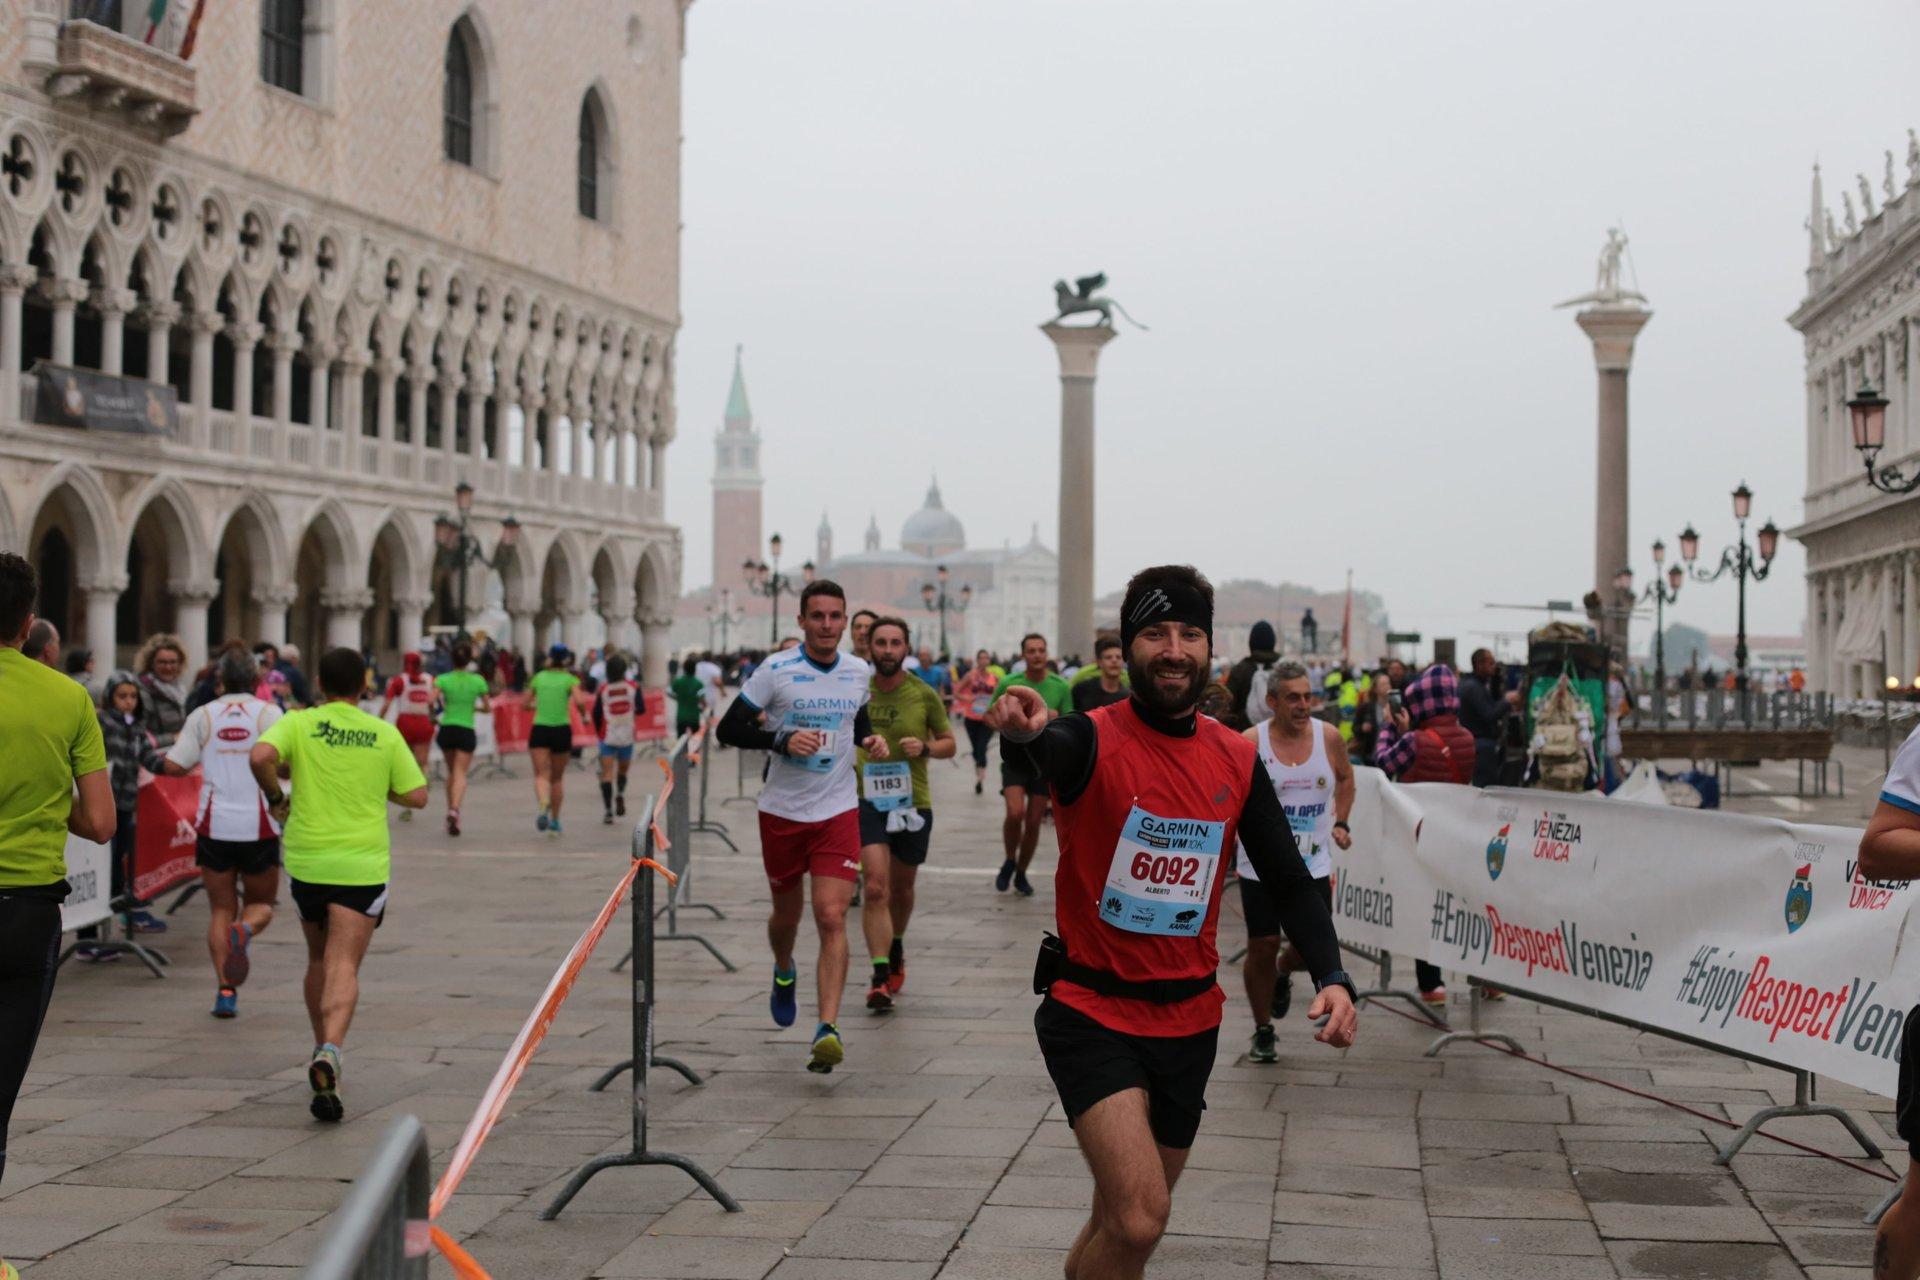 Venice Marathon (Maratona di Venezia) in Venice - Best Time